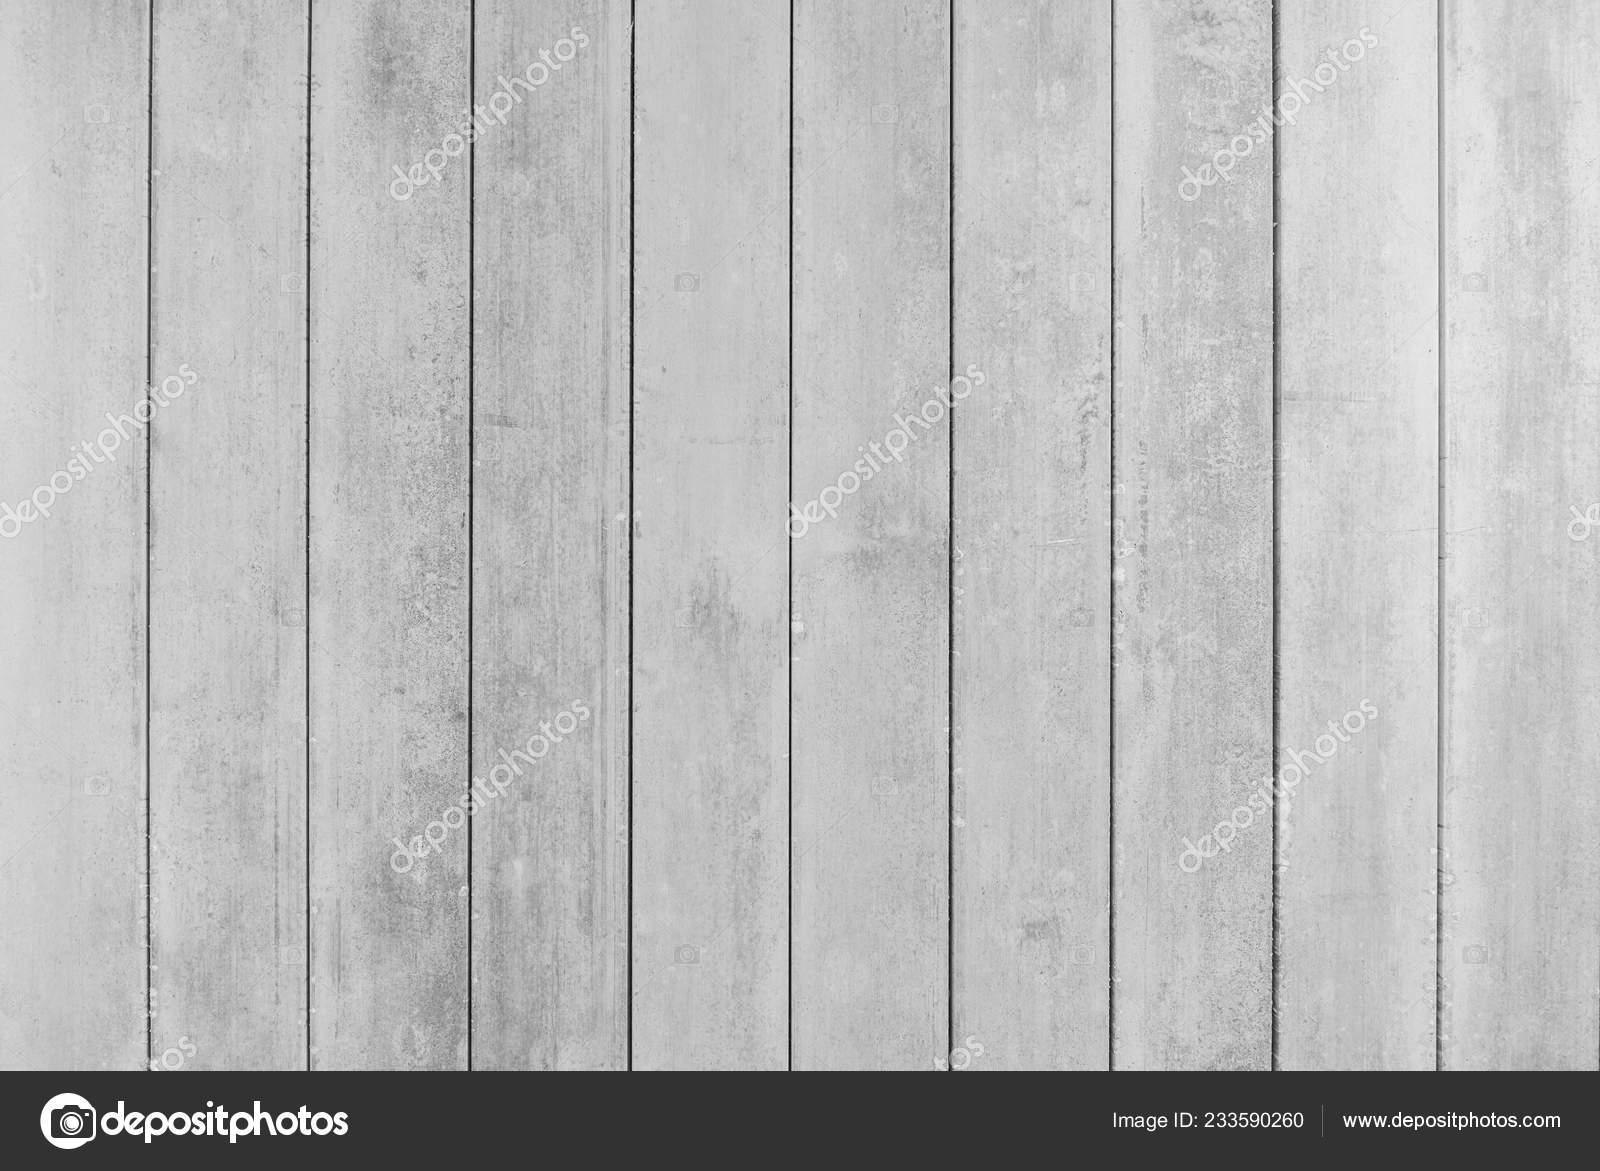 Background Texture Post Tension Concrete Slab Floor Ceiling